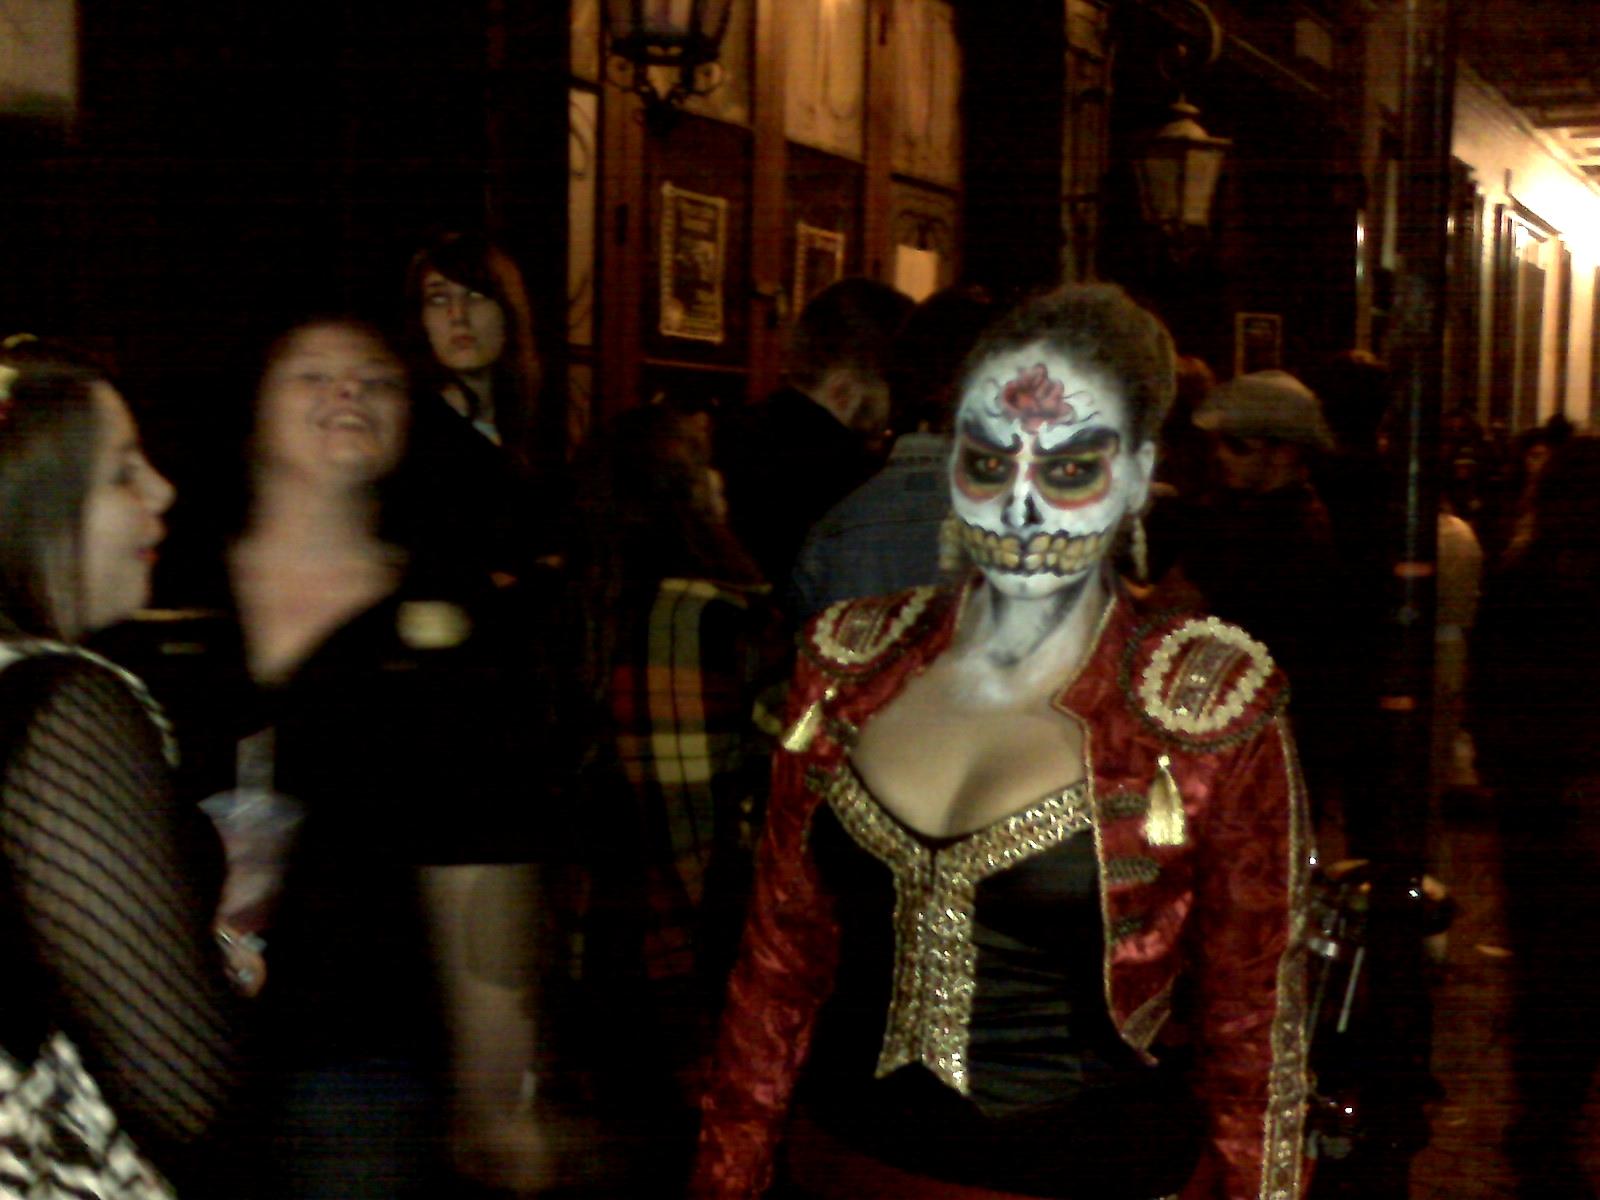 FileHalloween 2009 New Orleans Skullface epaulets.jpg & File:Halloween 2009 New Orleans Skullface epaulets.jpg - Wikimedia ...